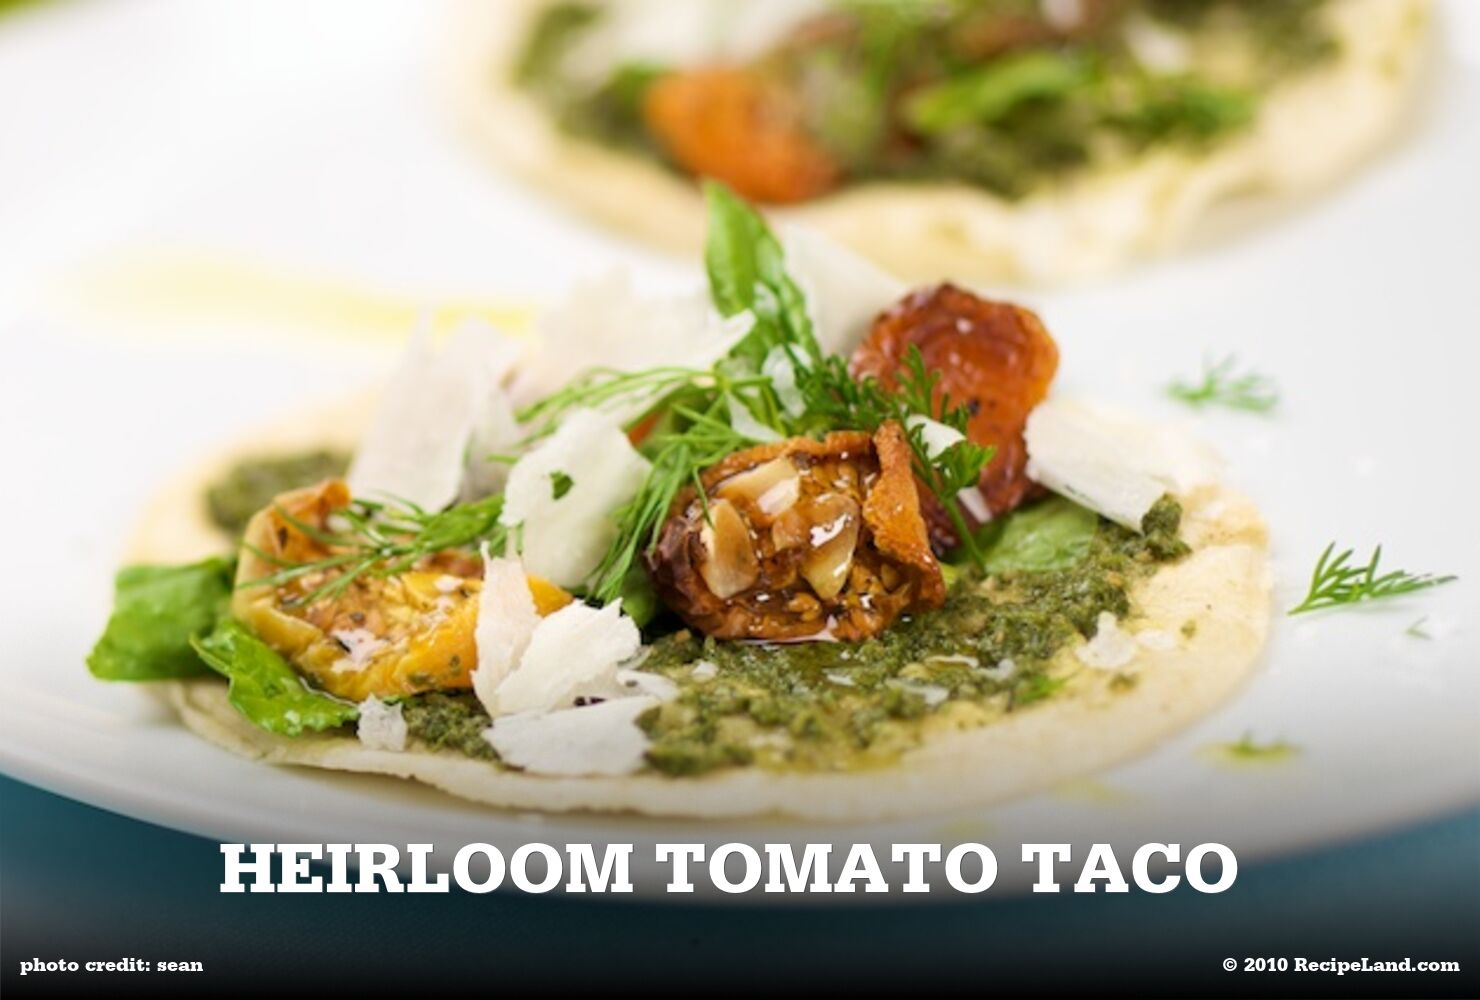 Heirloom Tomato Taco